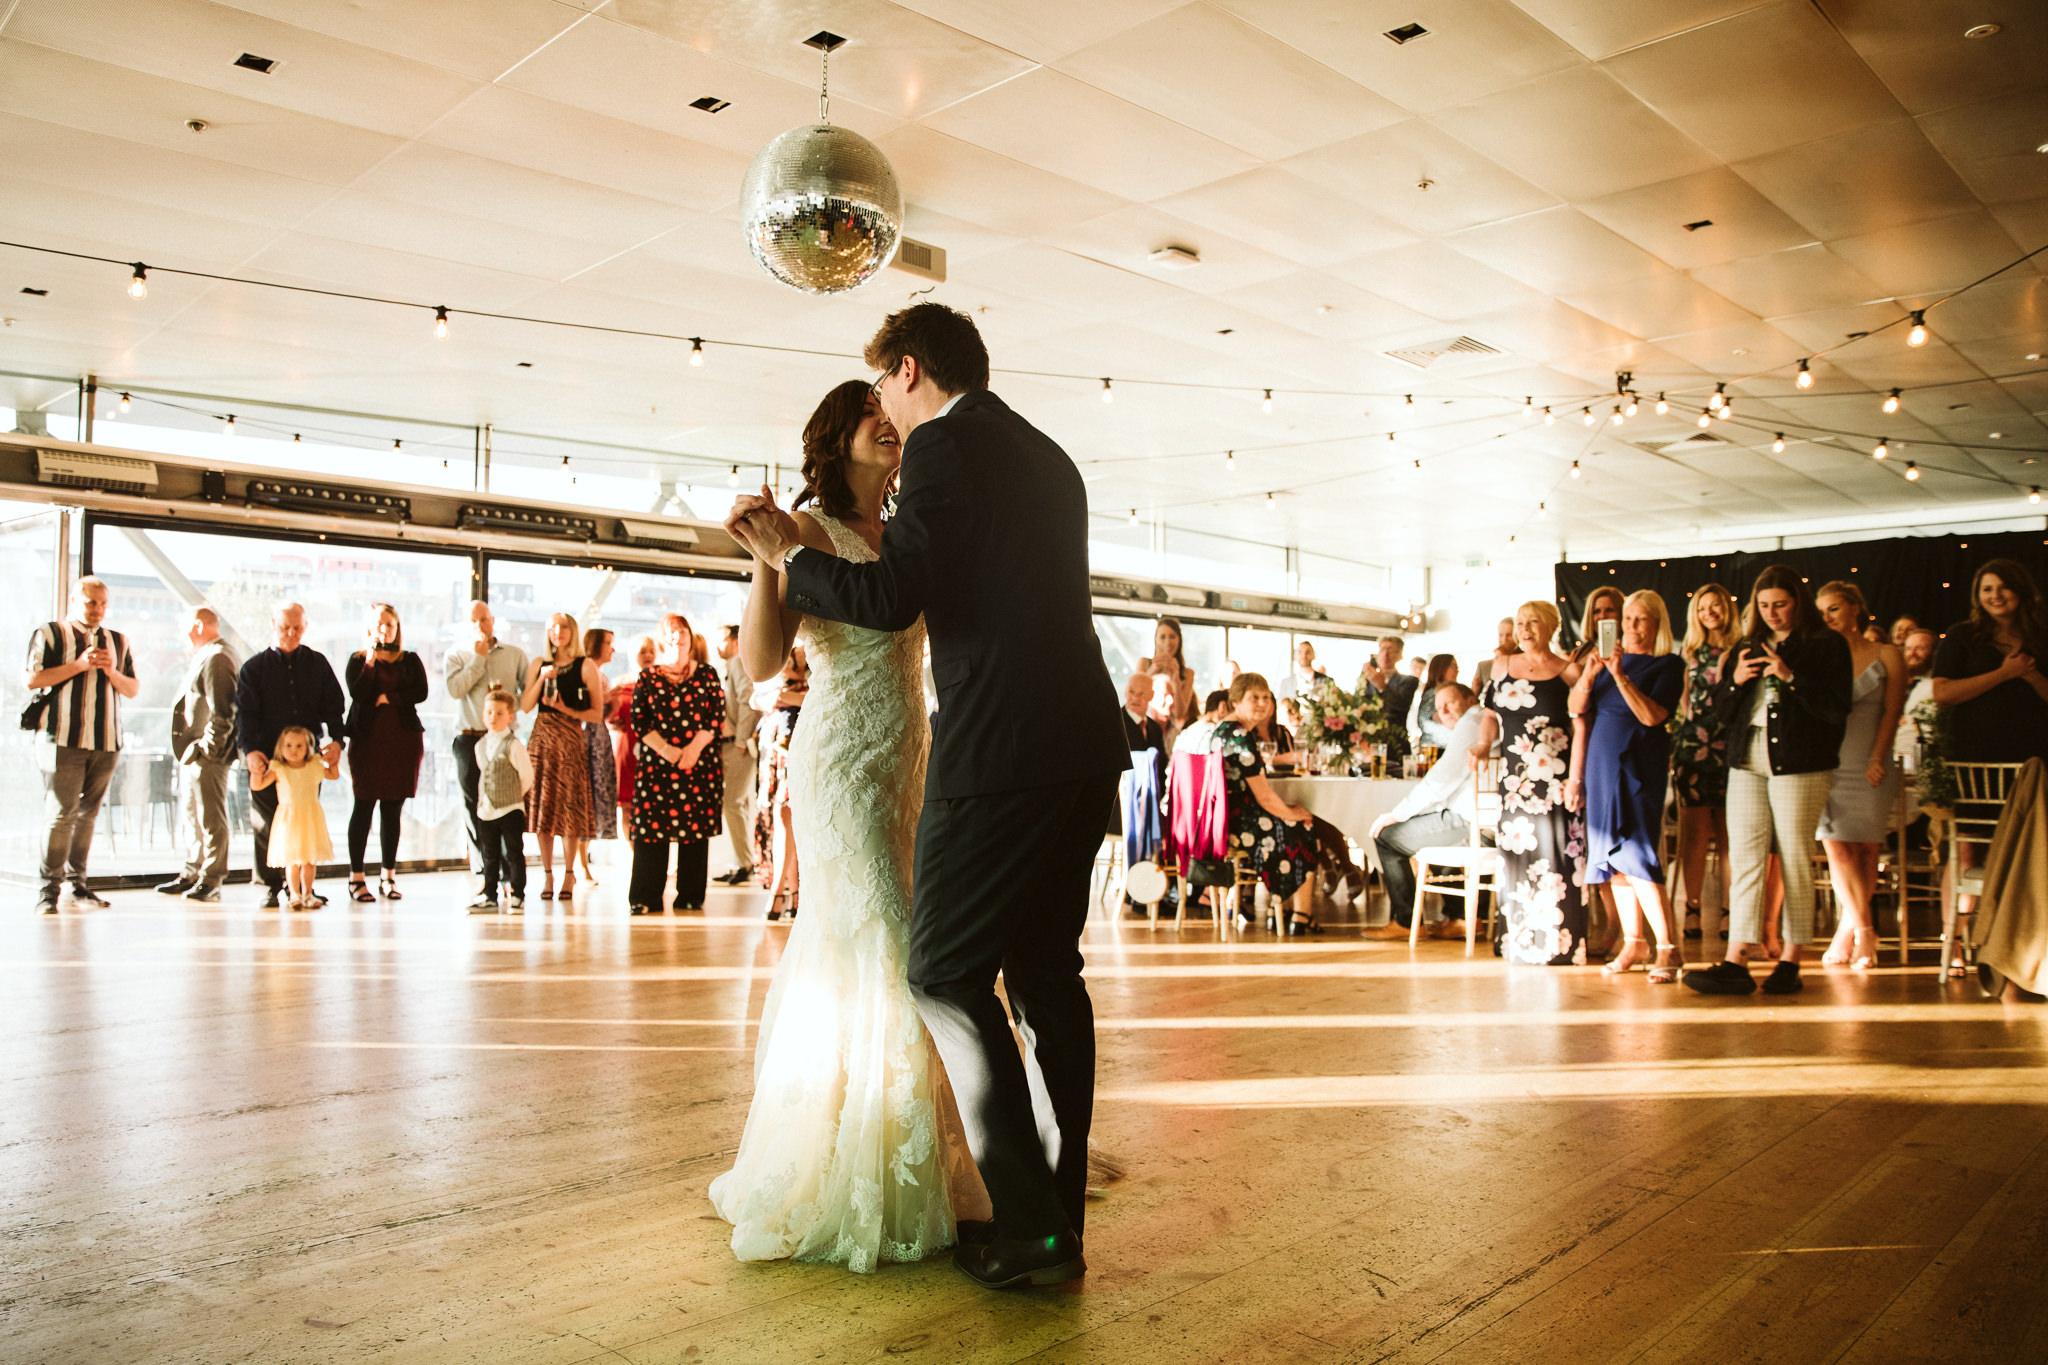 baltic-wedding-margarita-hope (86).jpg